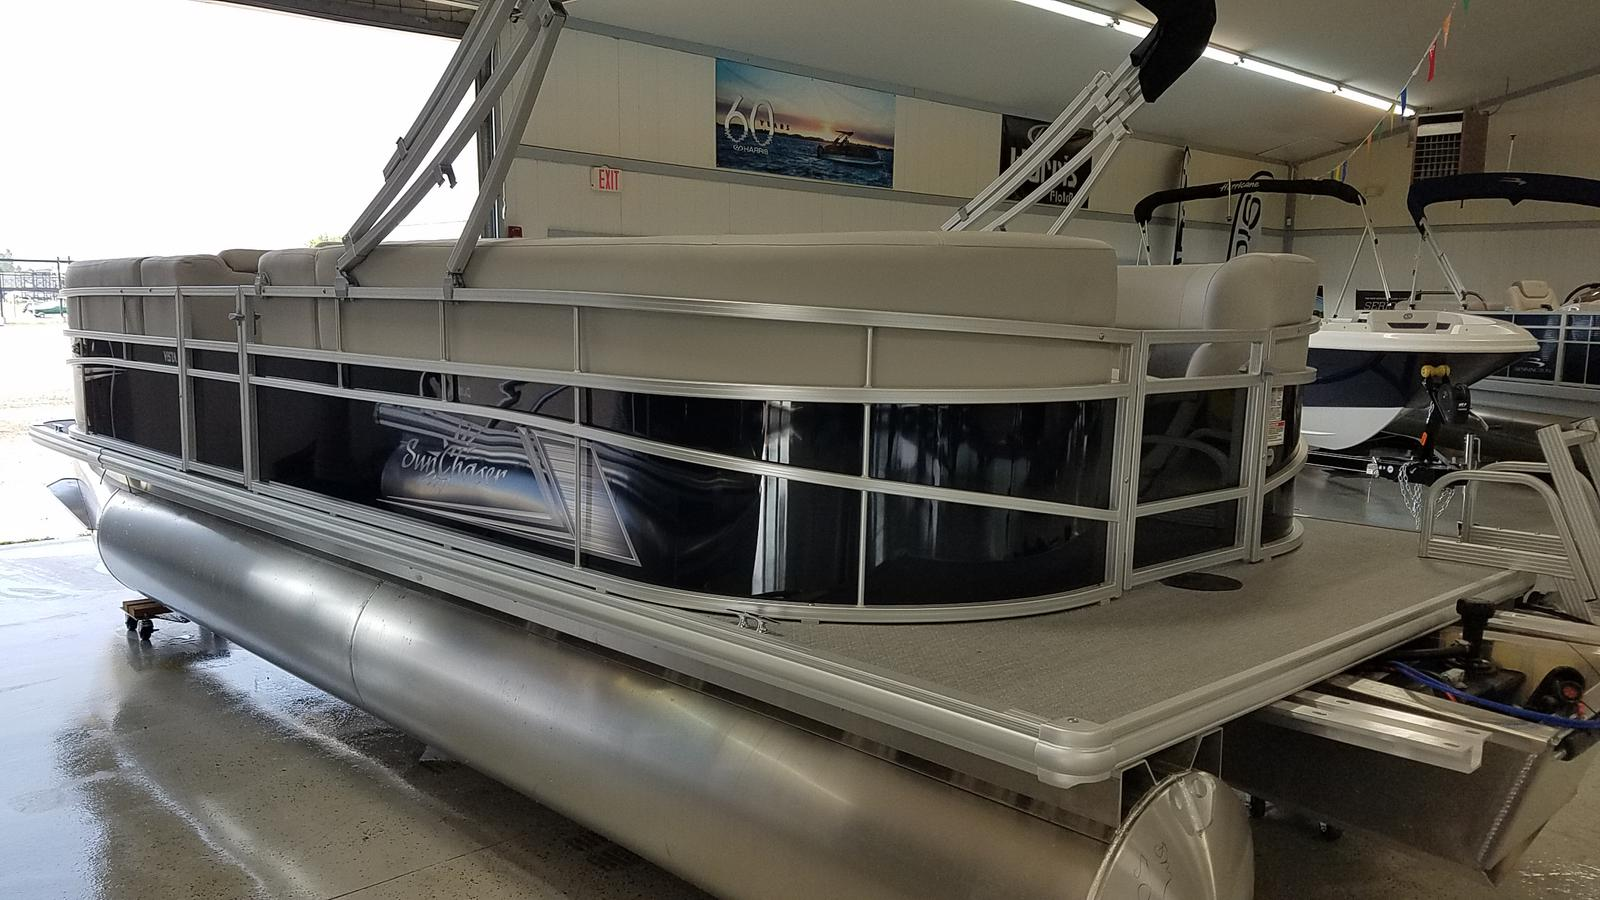 2021 SunChaser boat for sale, model of the boat is Vista 22 LR & Image # 3 of 7